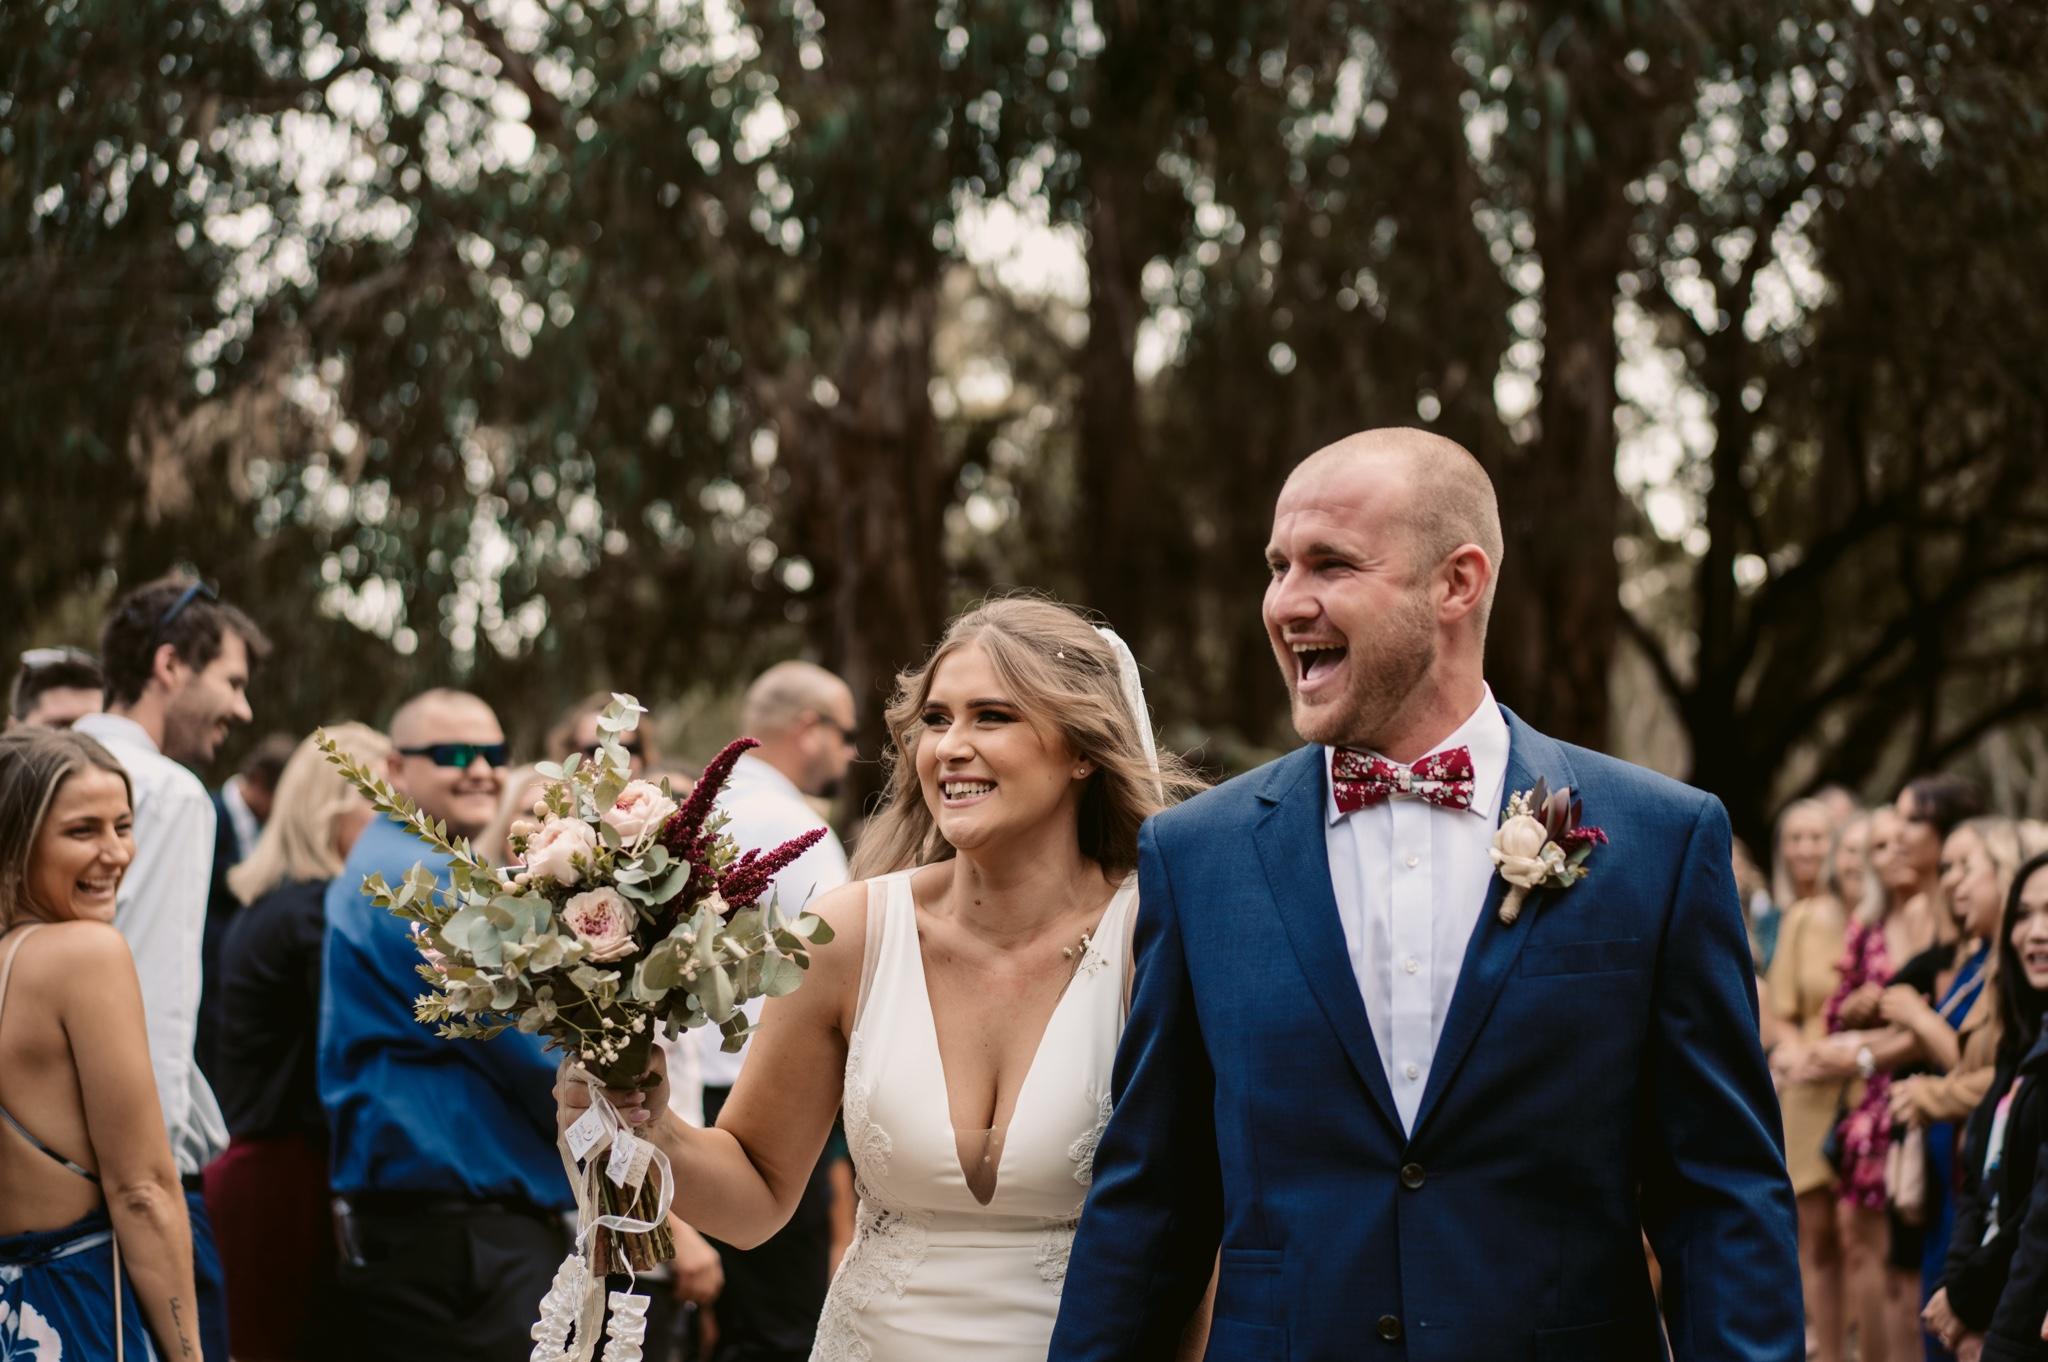 Mornington Peninsula Wedding Photography59.jpg